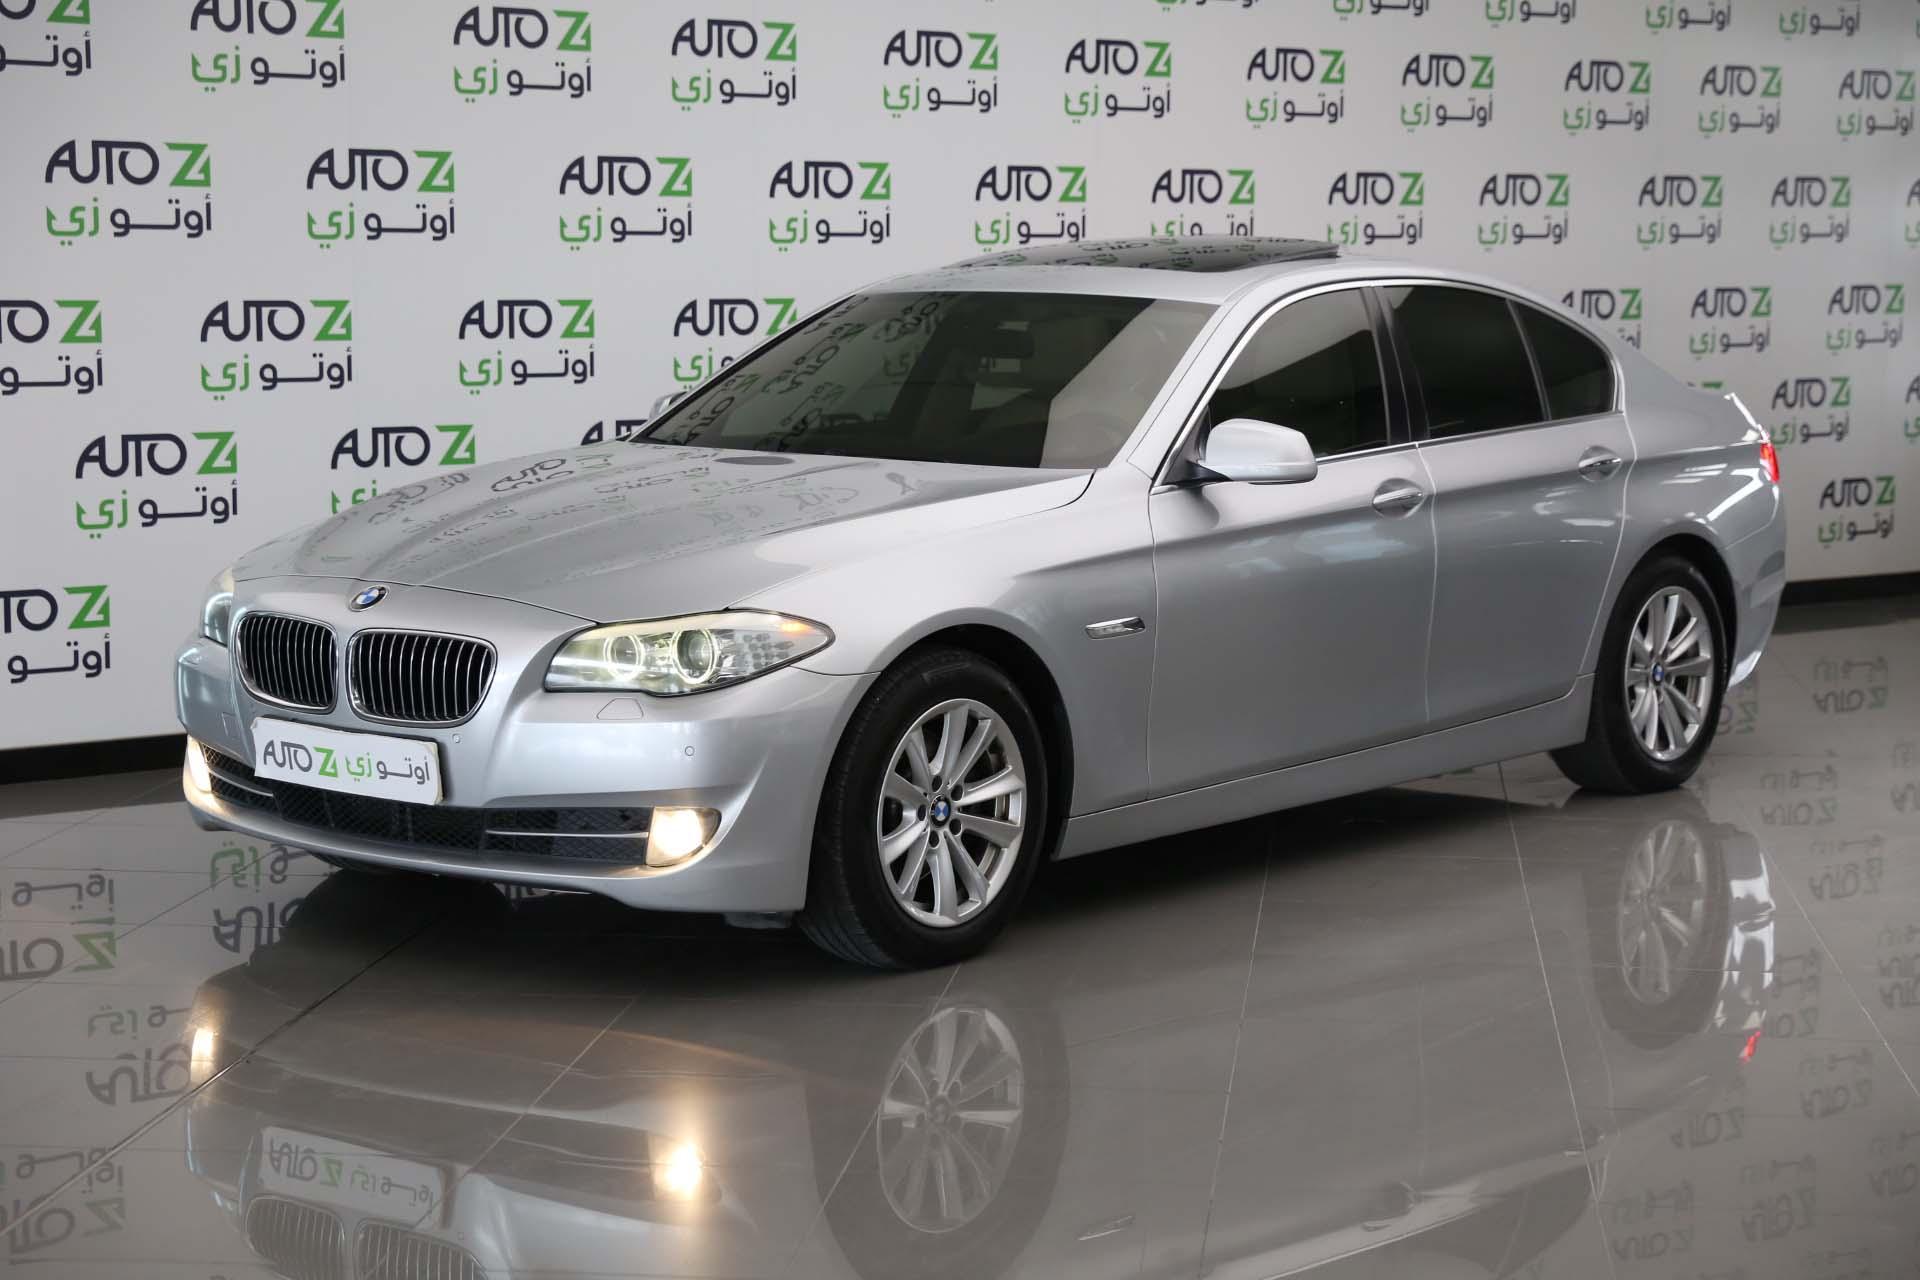 BMW 5-Series 520i—2012